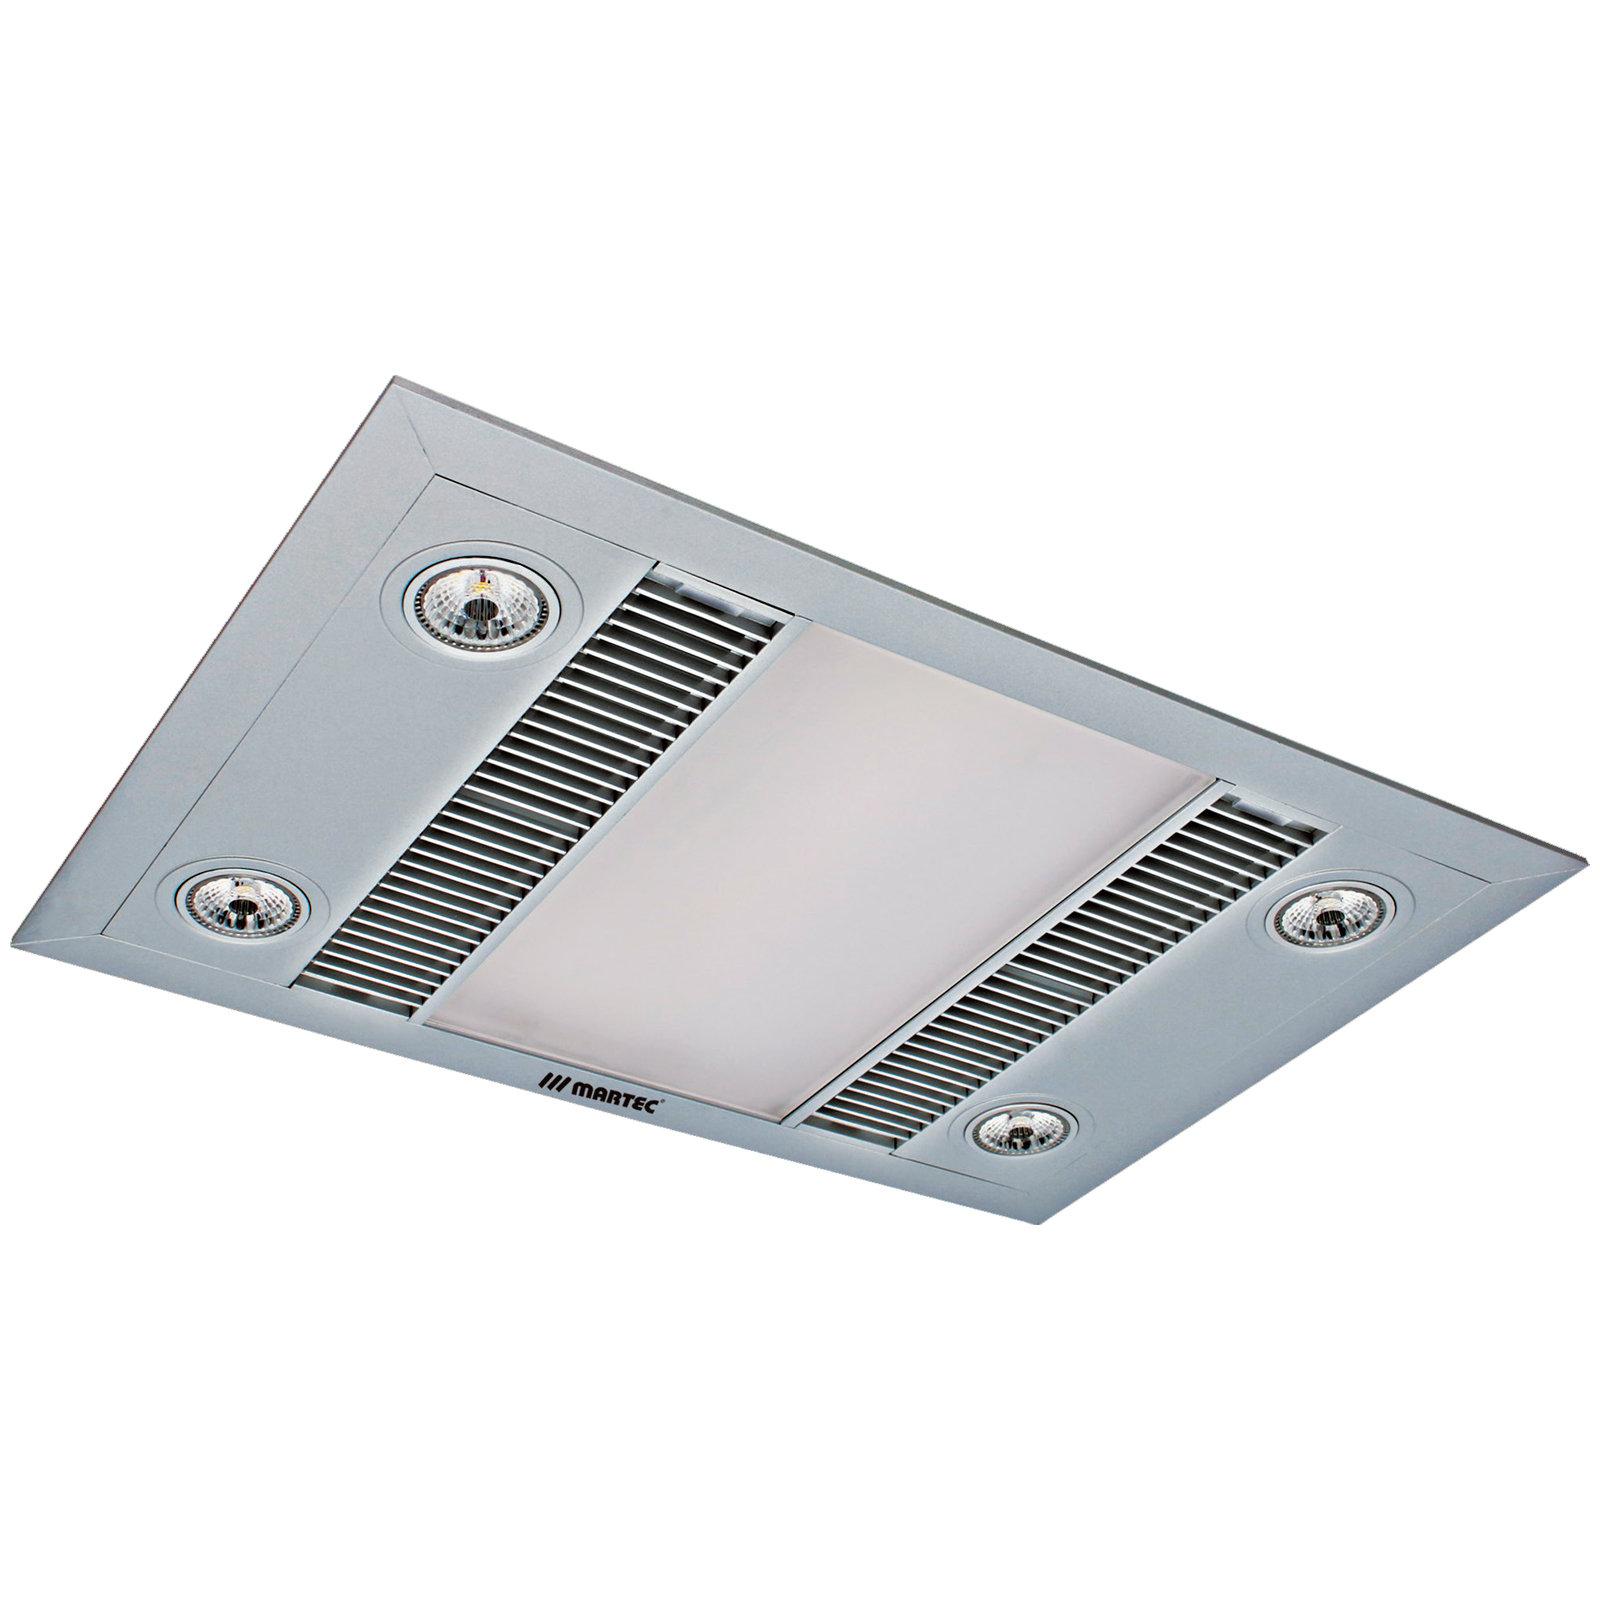 rb 7354 heat lamp wiring diagram along